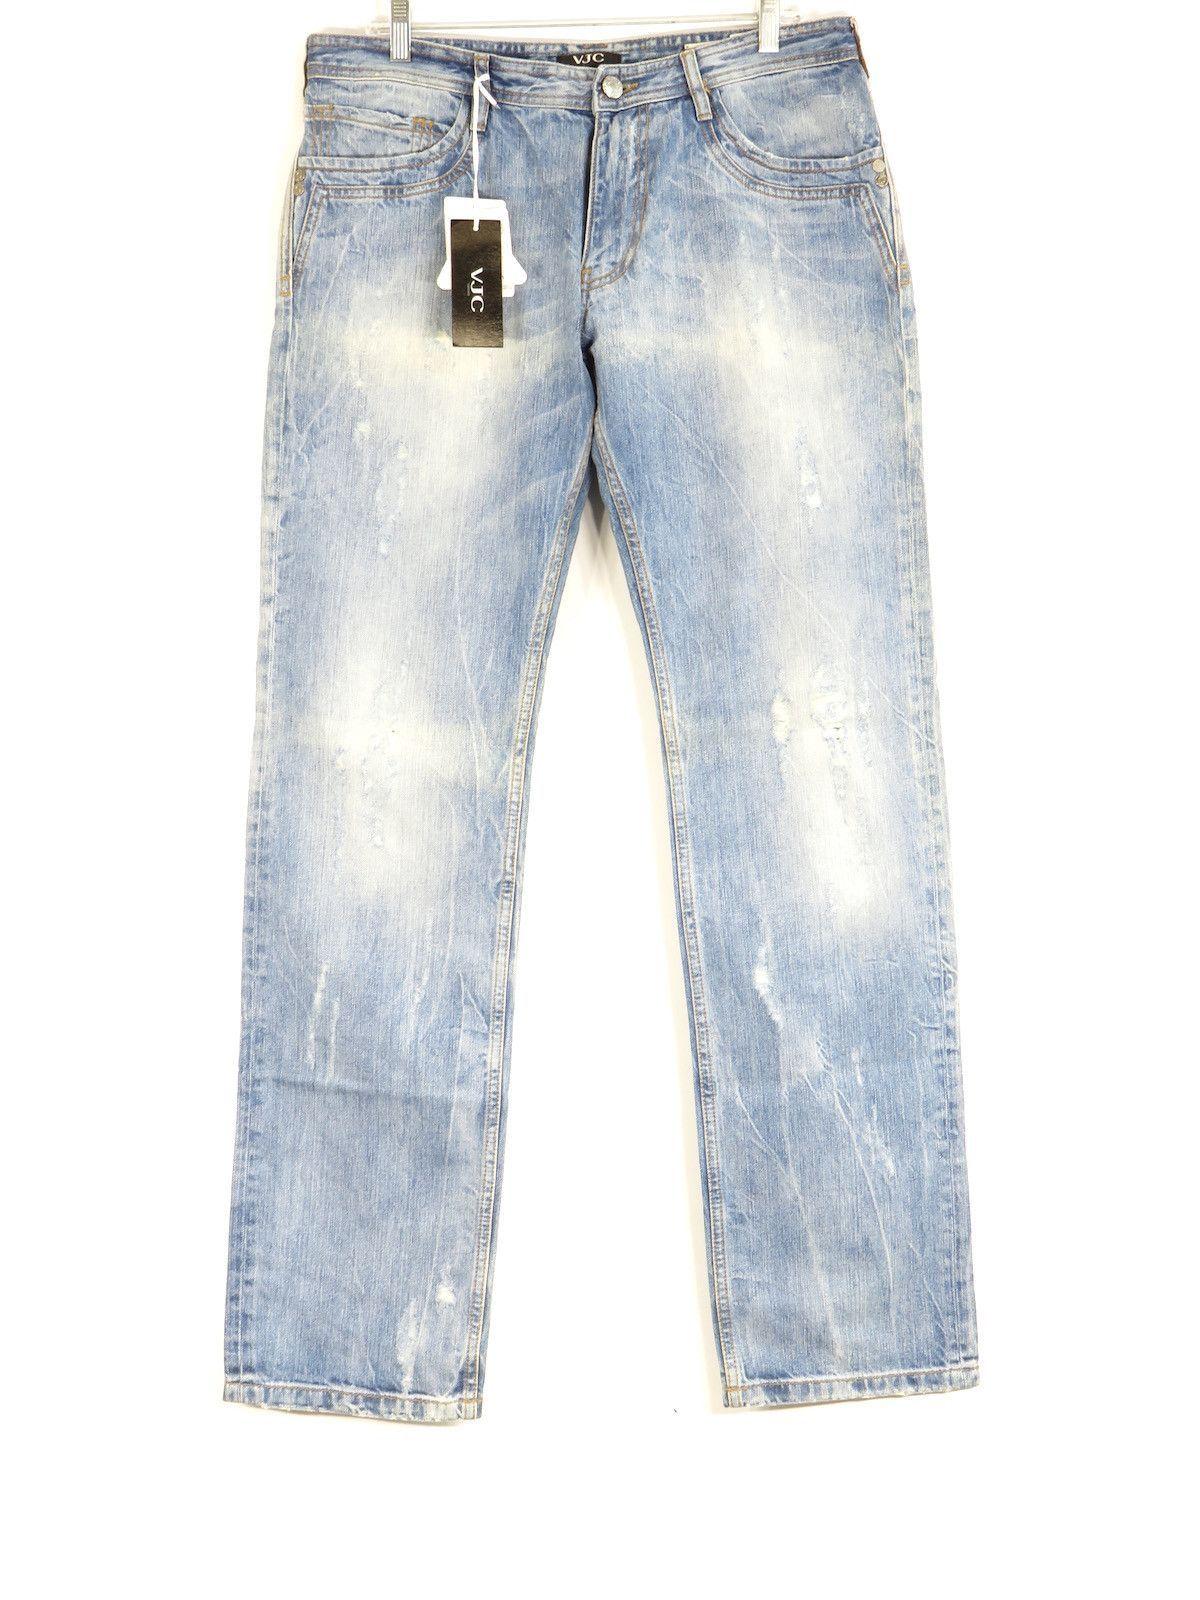 45ea4cdb VERSACE Jeans Couture Men Light Wash Regular Fit Distressed Jeans 36